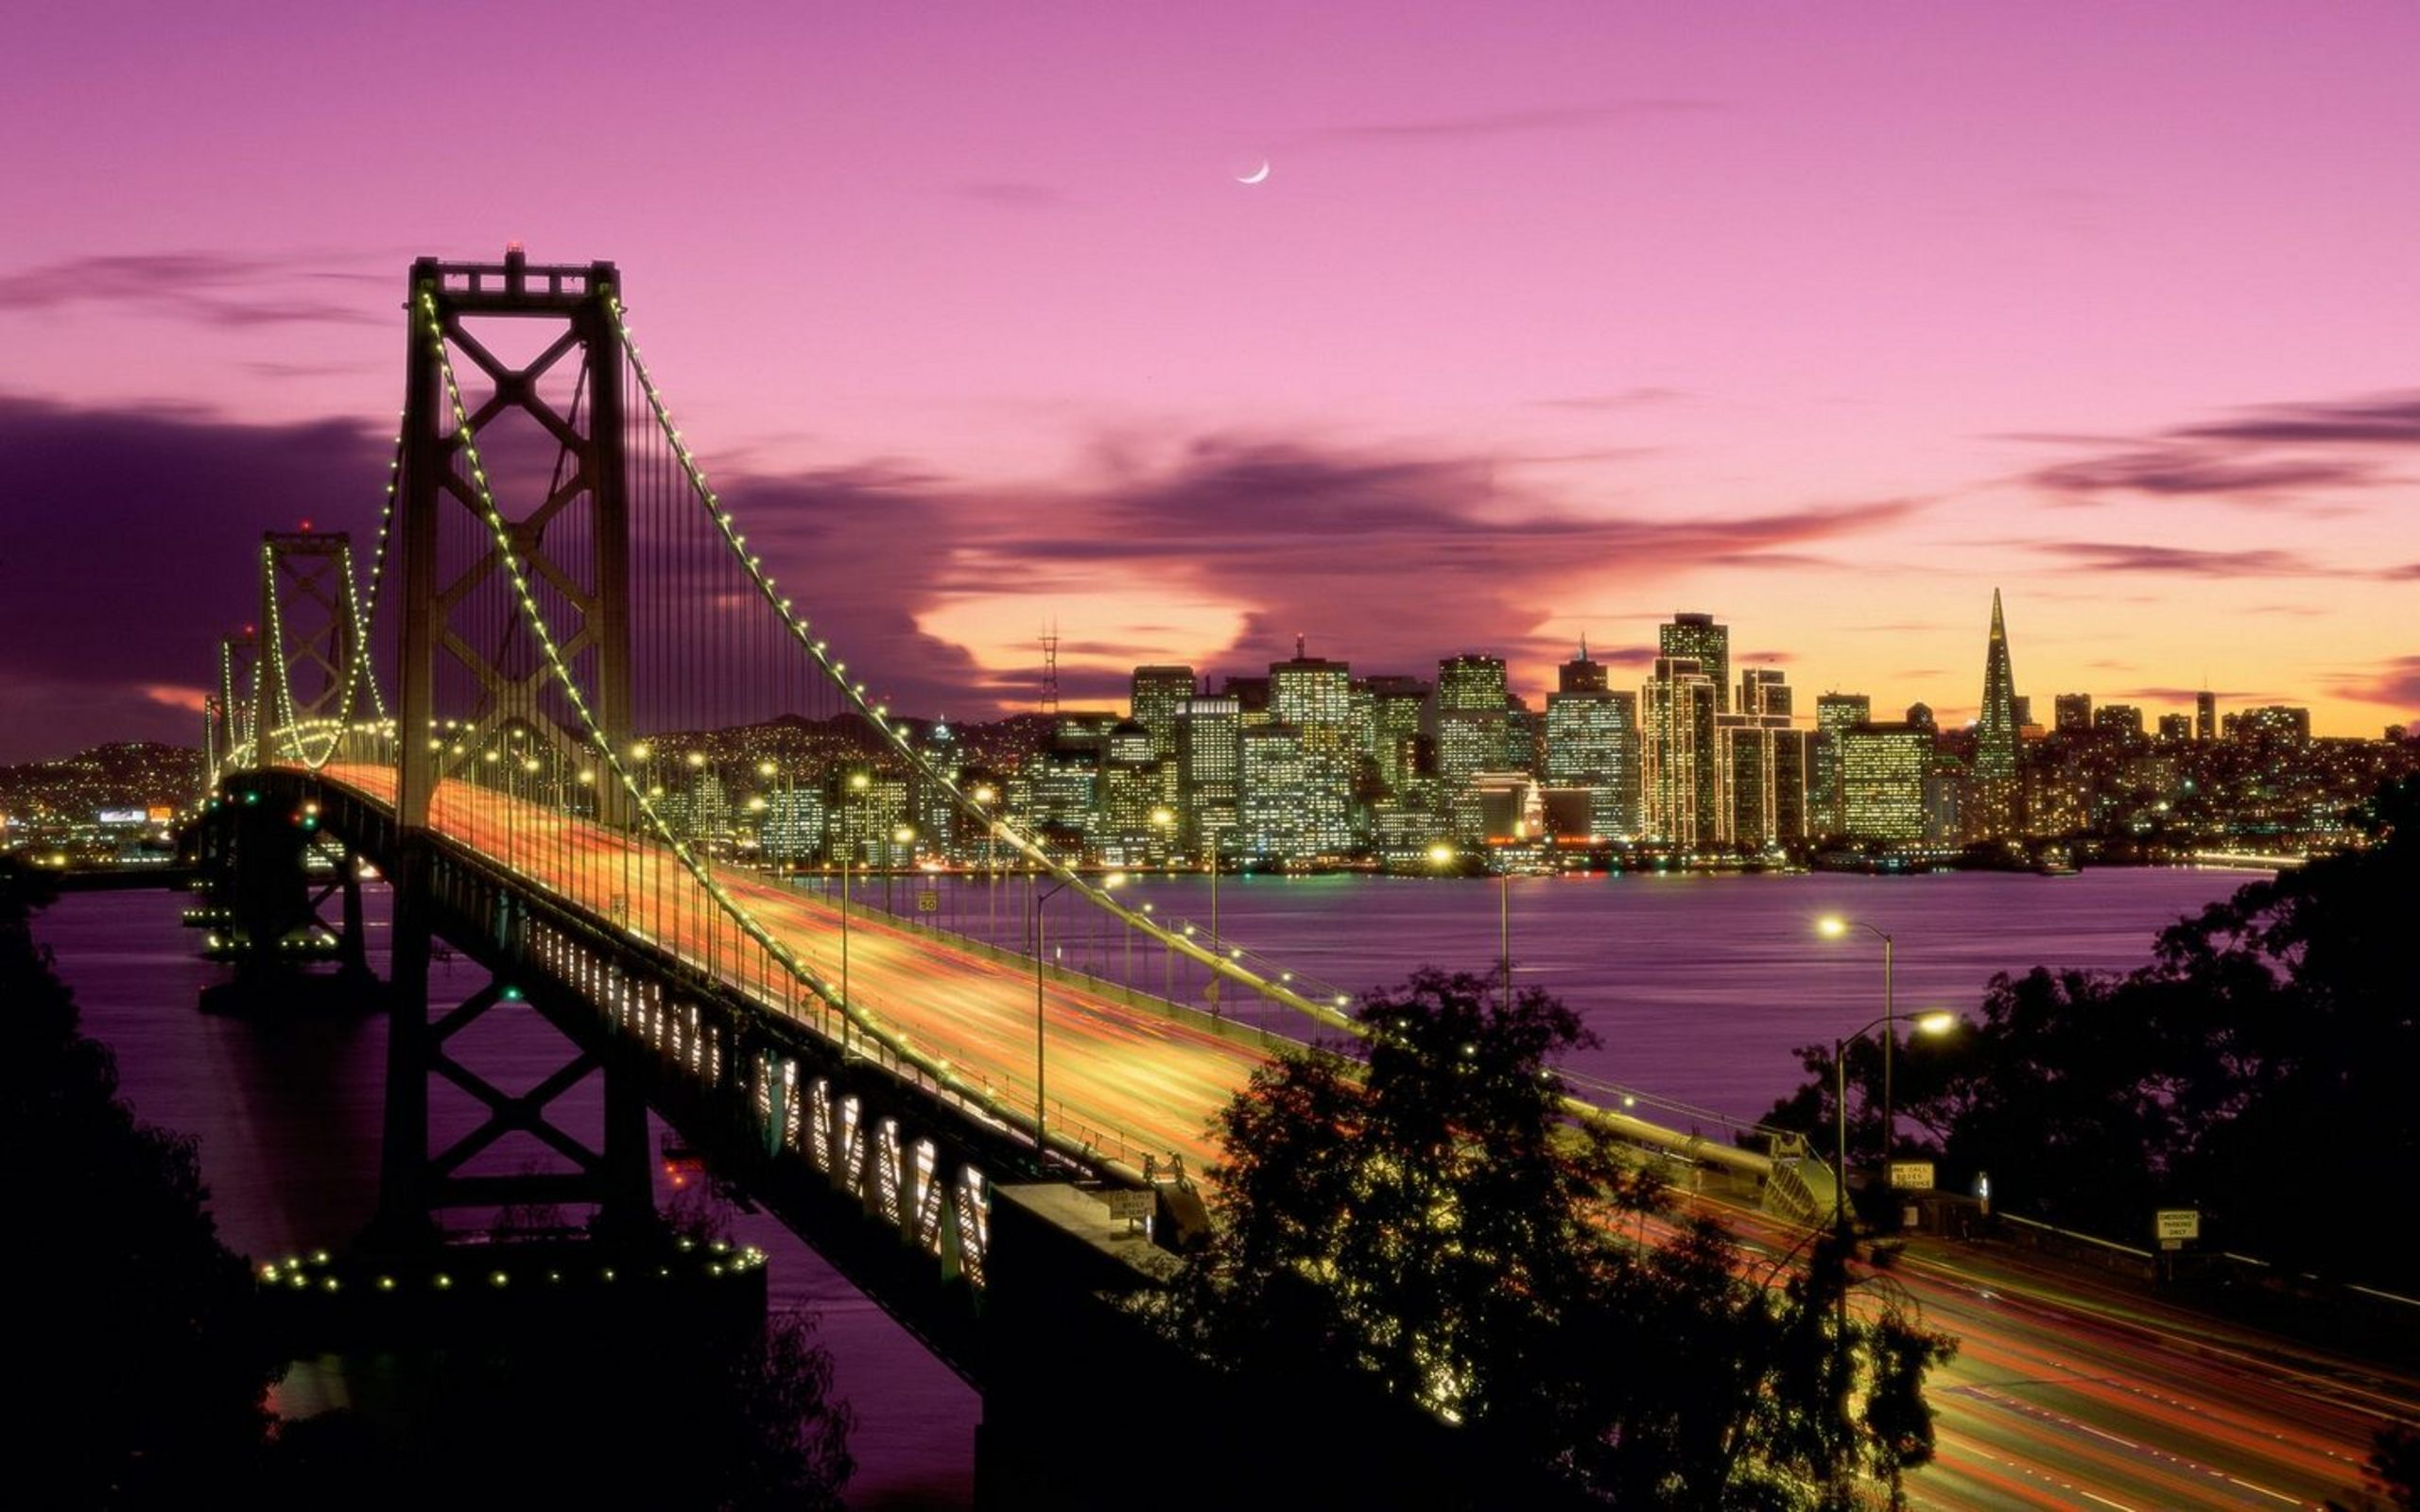 San Francisco Bridge California Wallpapers HD Wallpapers 2560x1600